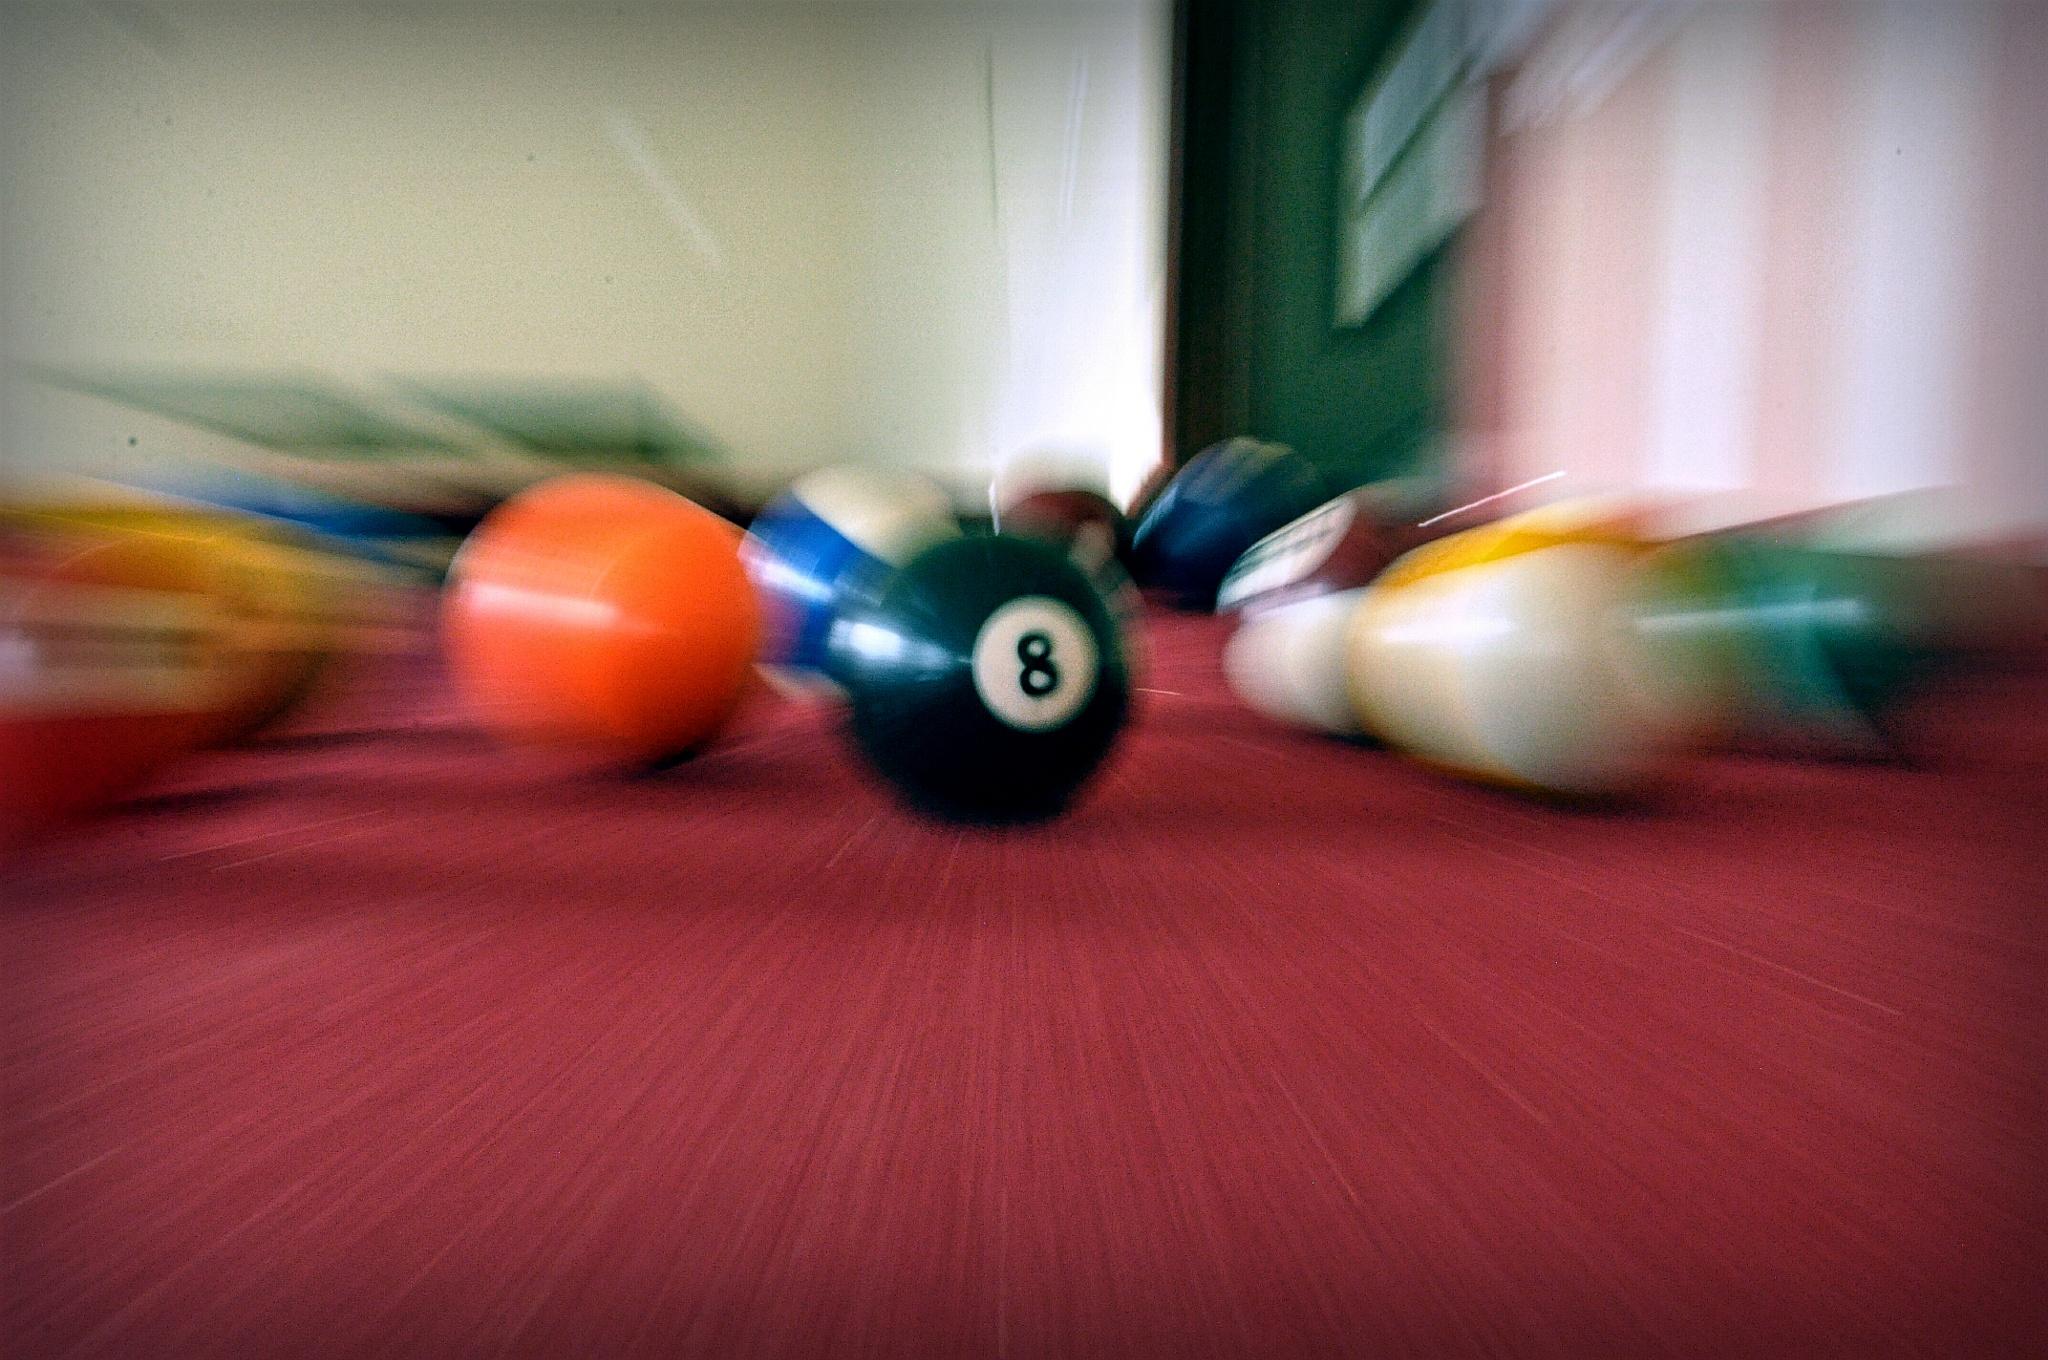 8 Ball by Brandyboy